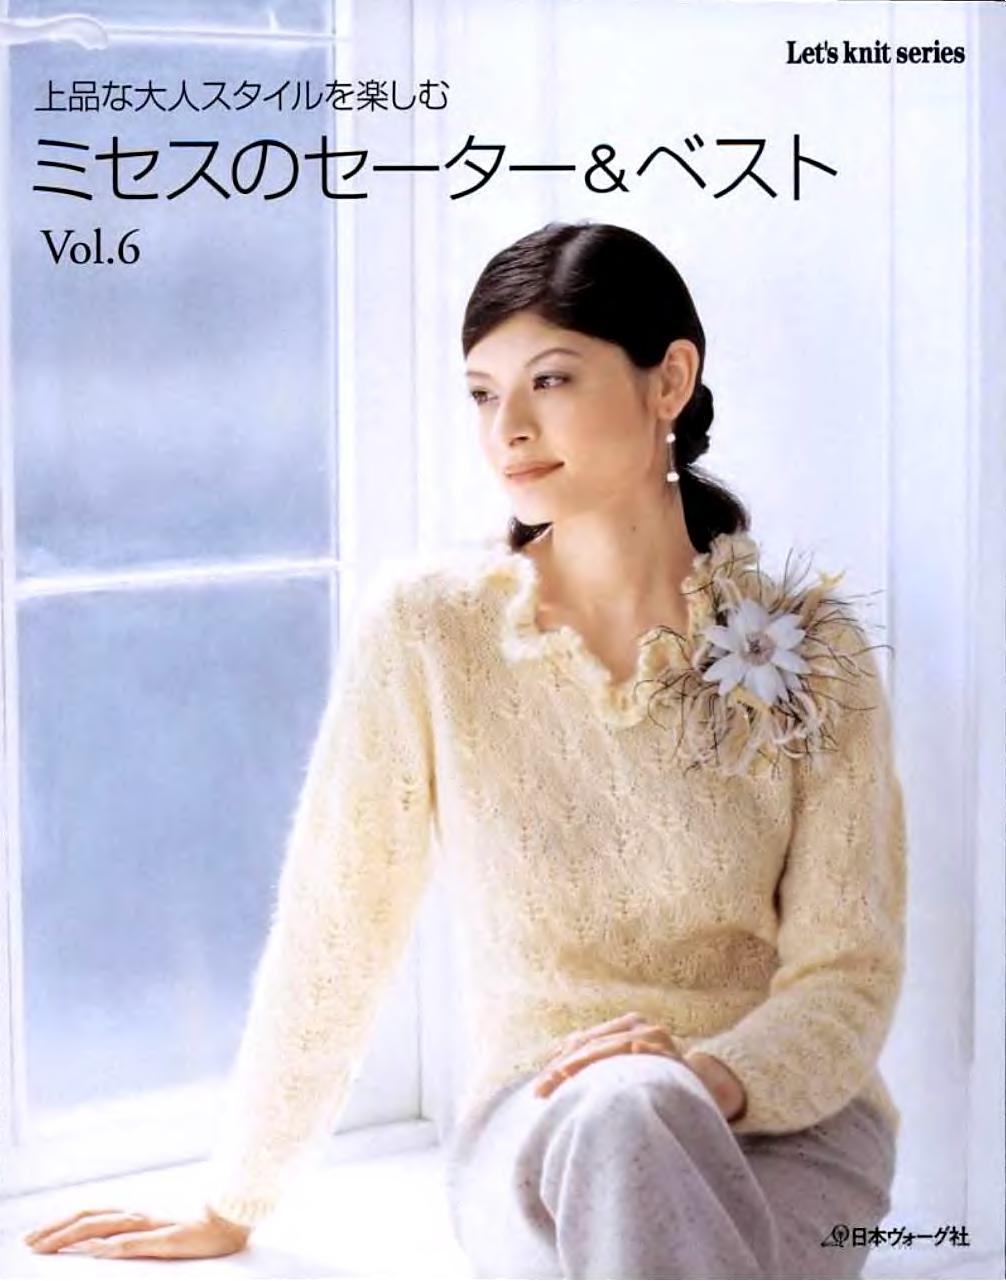 L.K.S.NV4245.vol.06_2006_1.jpg